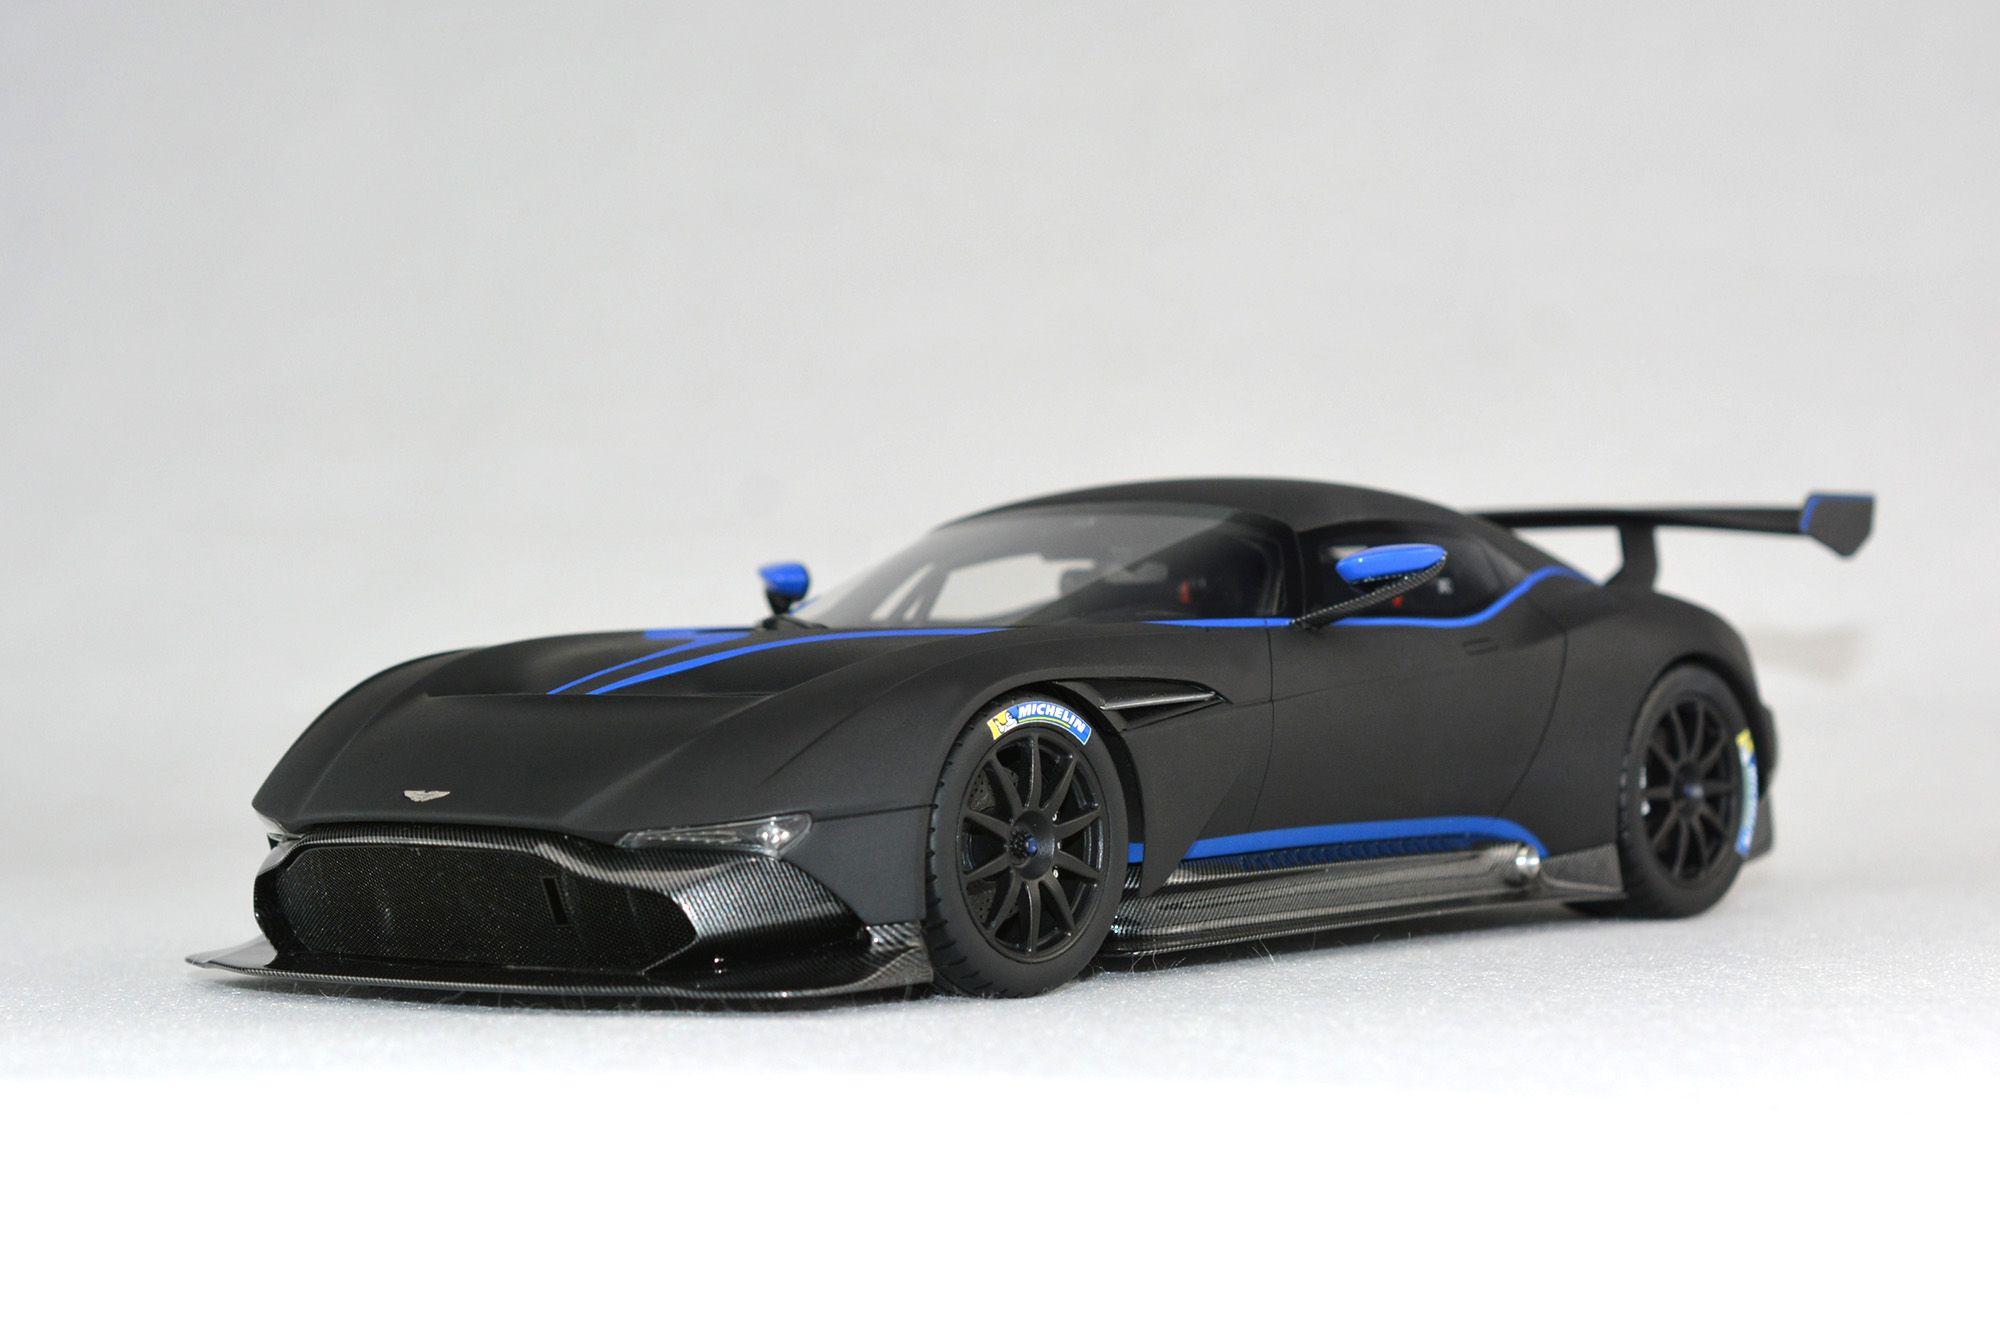 Aston Martin Vulcan In Matt Black And 1 18 For Buying Jefferson Fronti Art Com Super Cars Aston Martin Vulcan Car Model